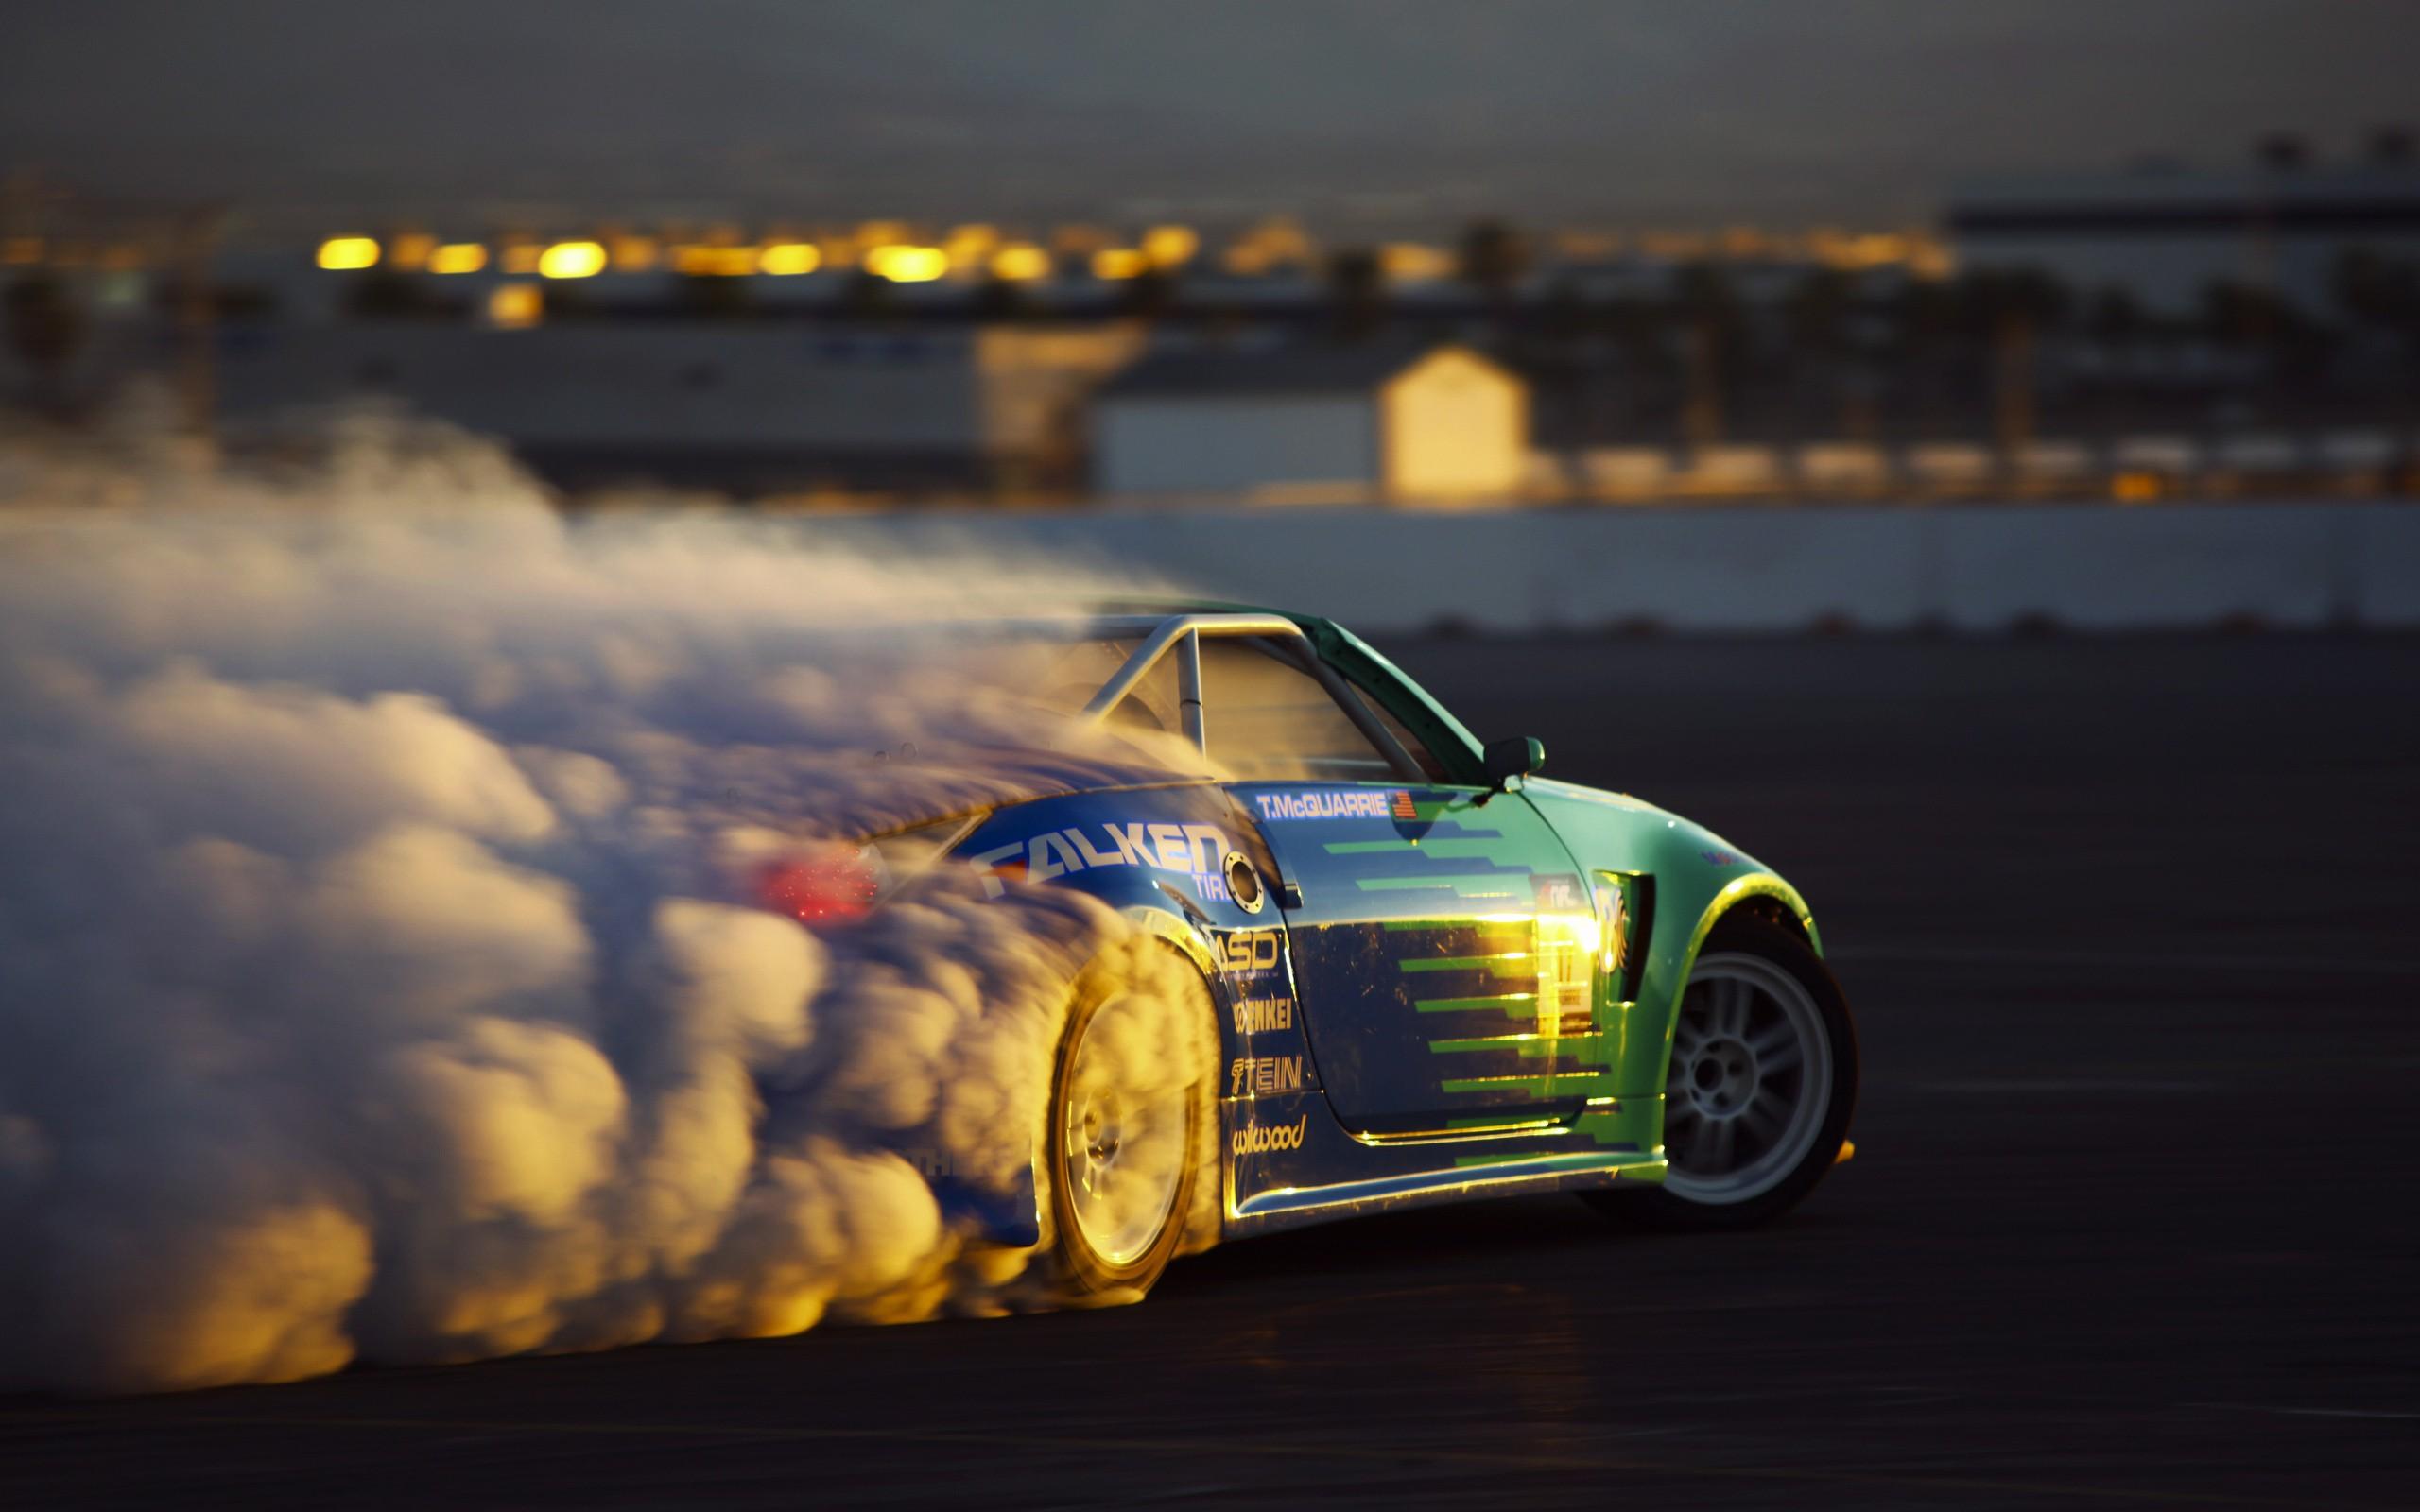 69 Drifting Cars Wallpaper On Wallpapersafari